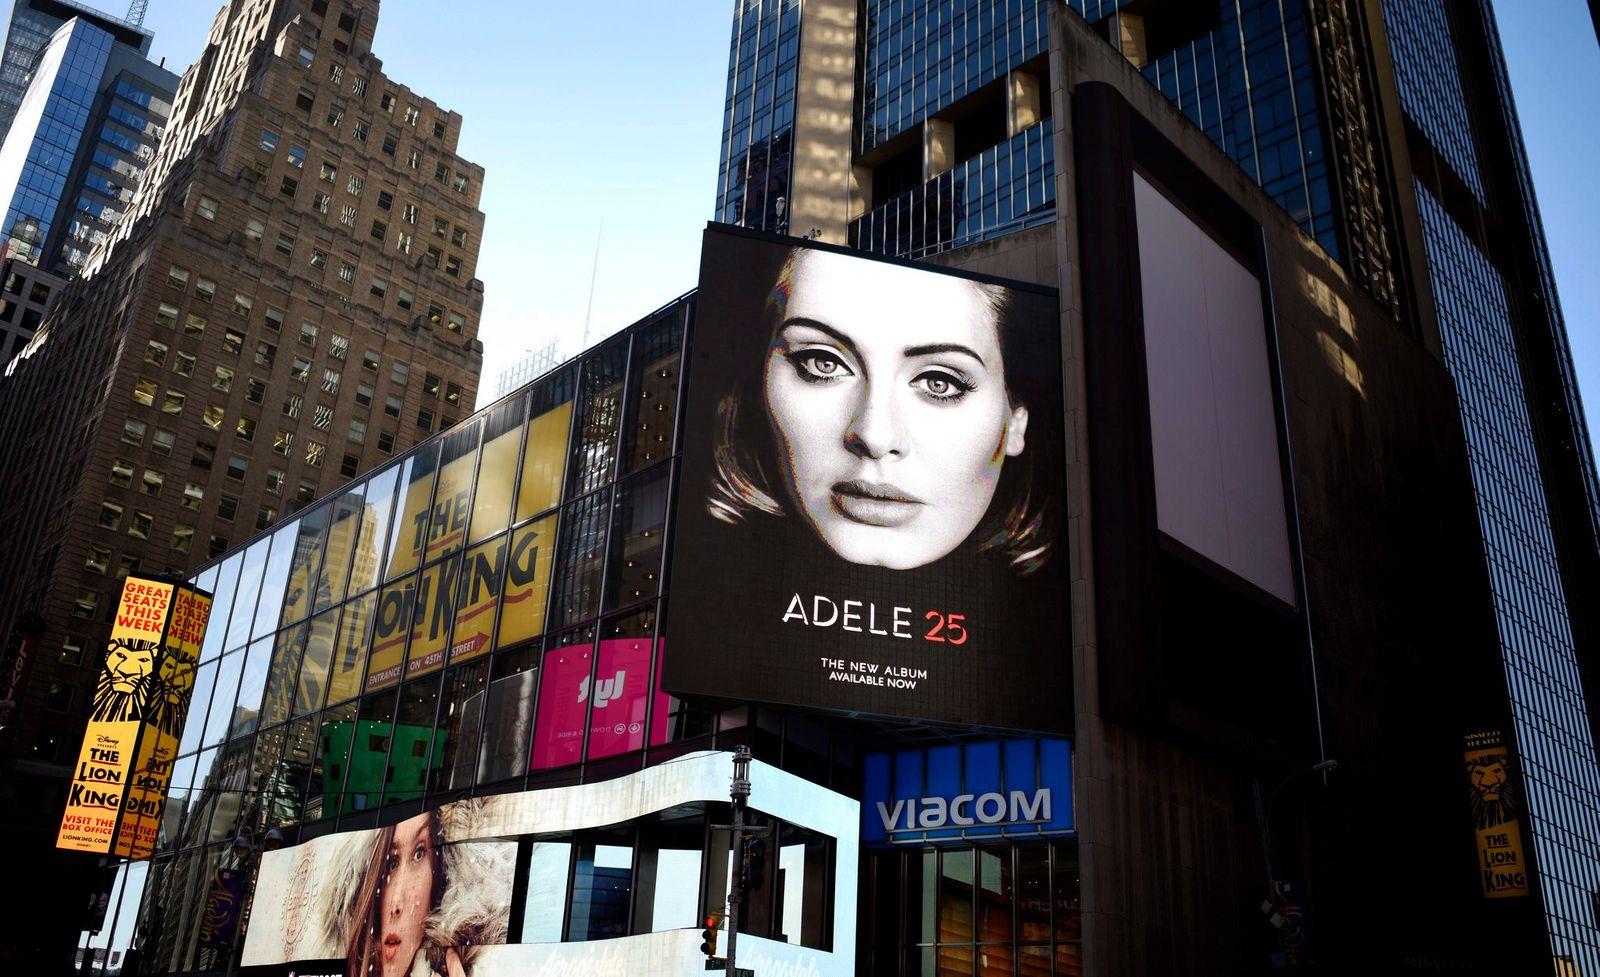 Adele 25 Adele 25 Adele Album Sales